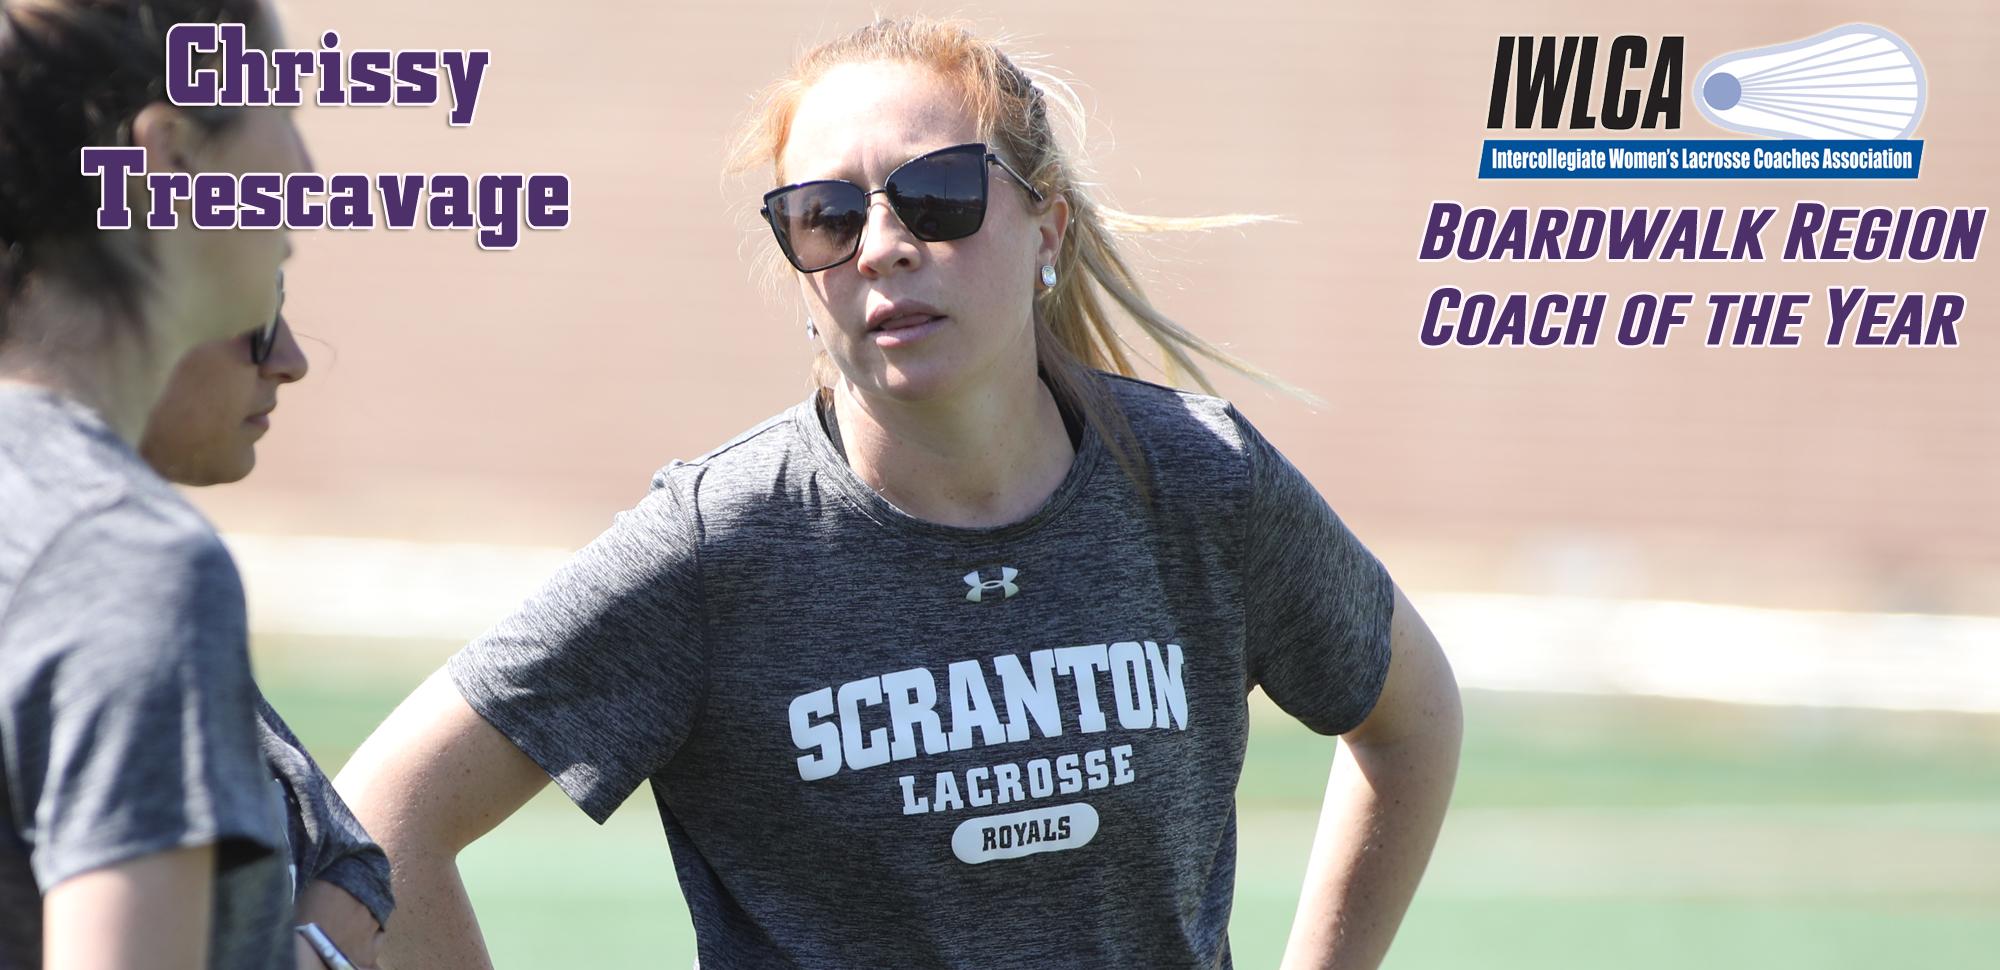 http://athletics.scranton.edu/sports/wlax/2018-19/trescavageiwlca.jpg